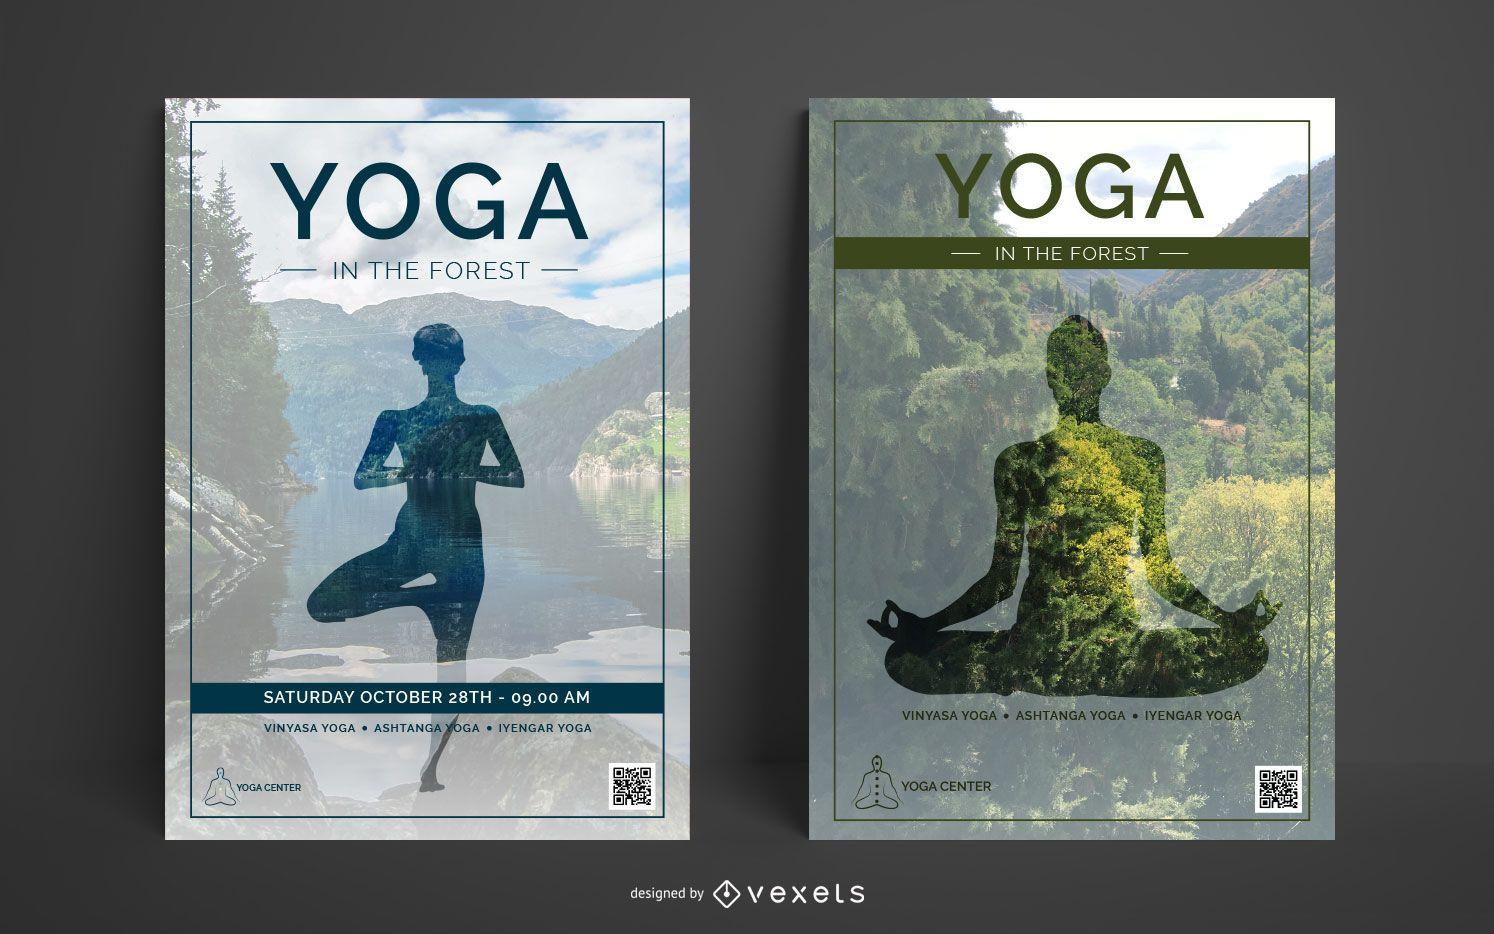 Yoga center poster template